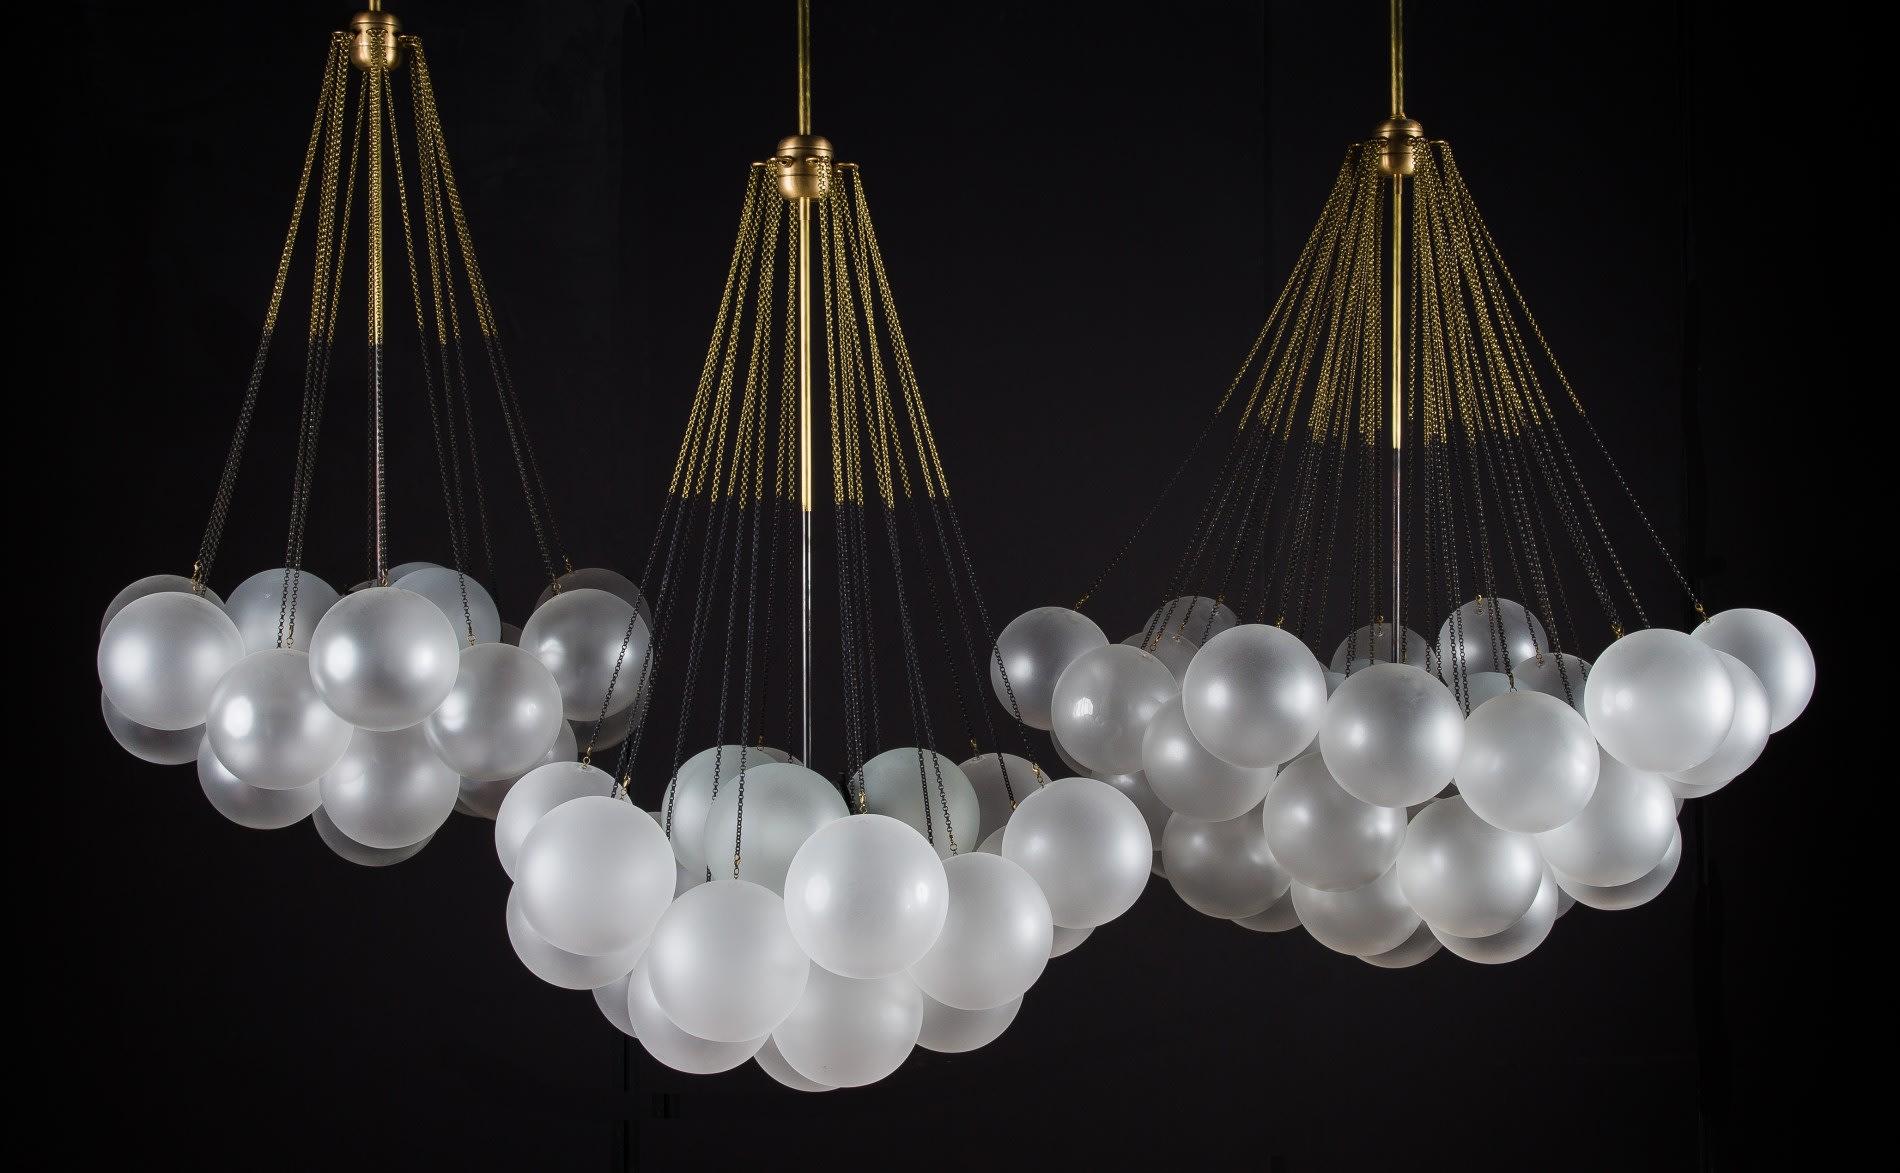 Lighting By Apparatus Studio At The Marlton Hotel New York Cloud Light Fixture